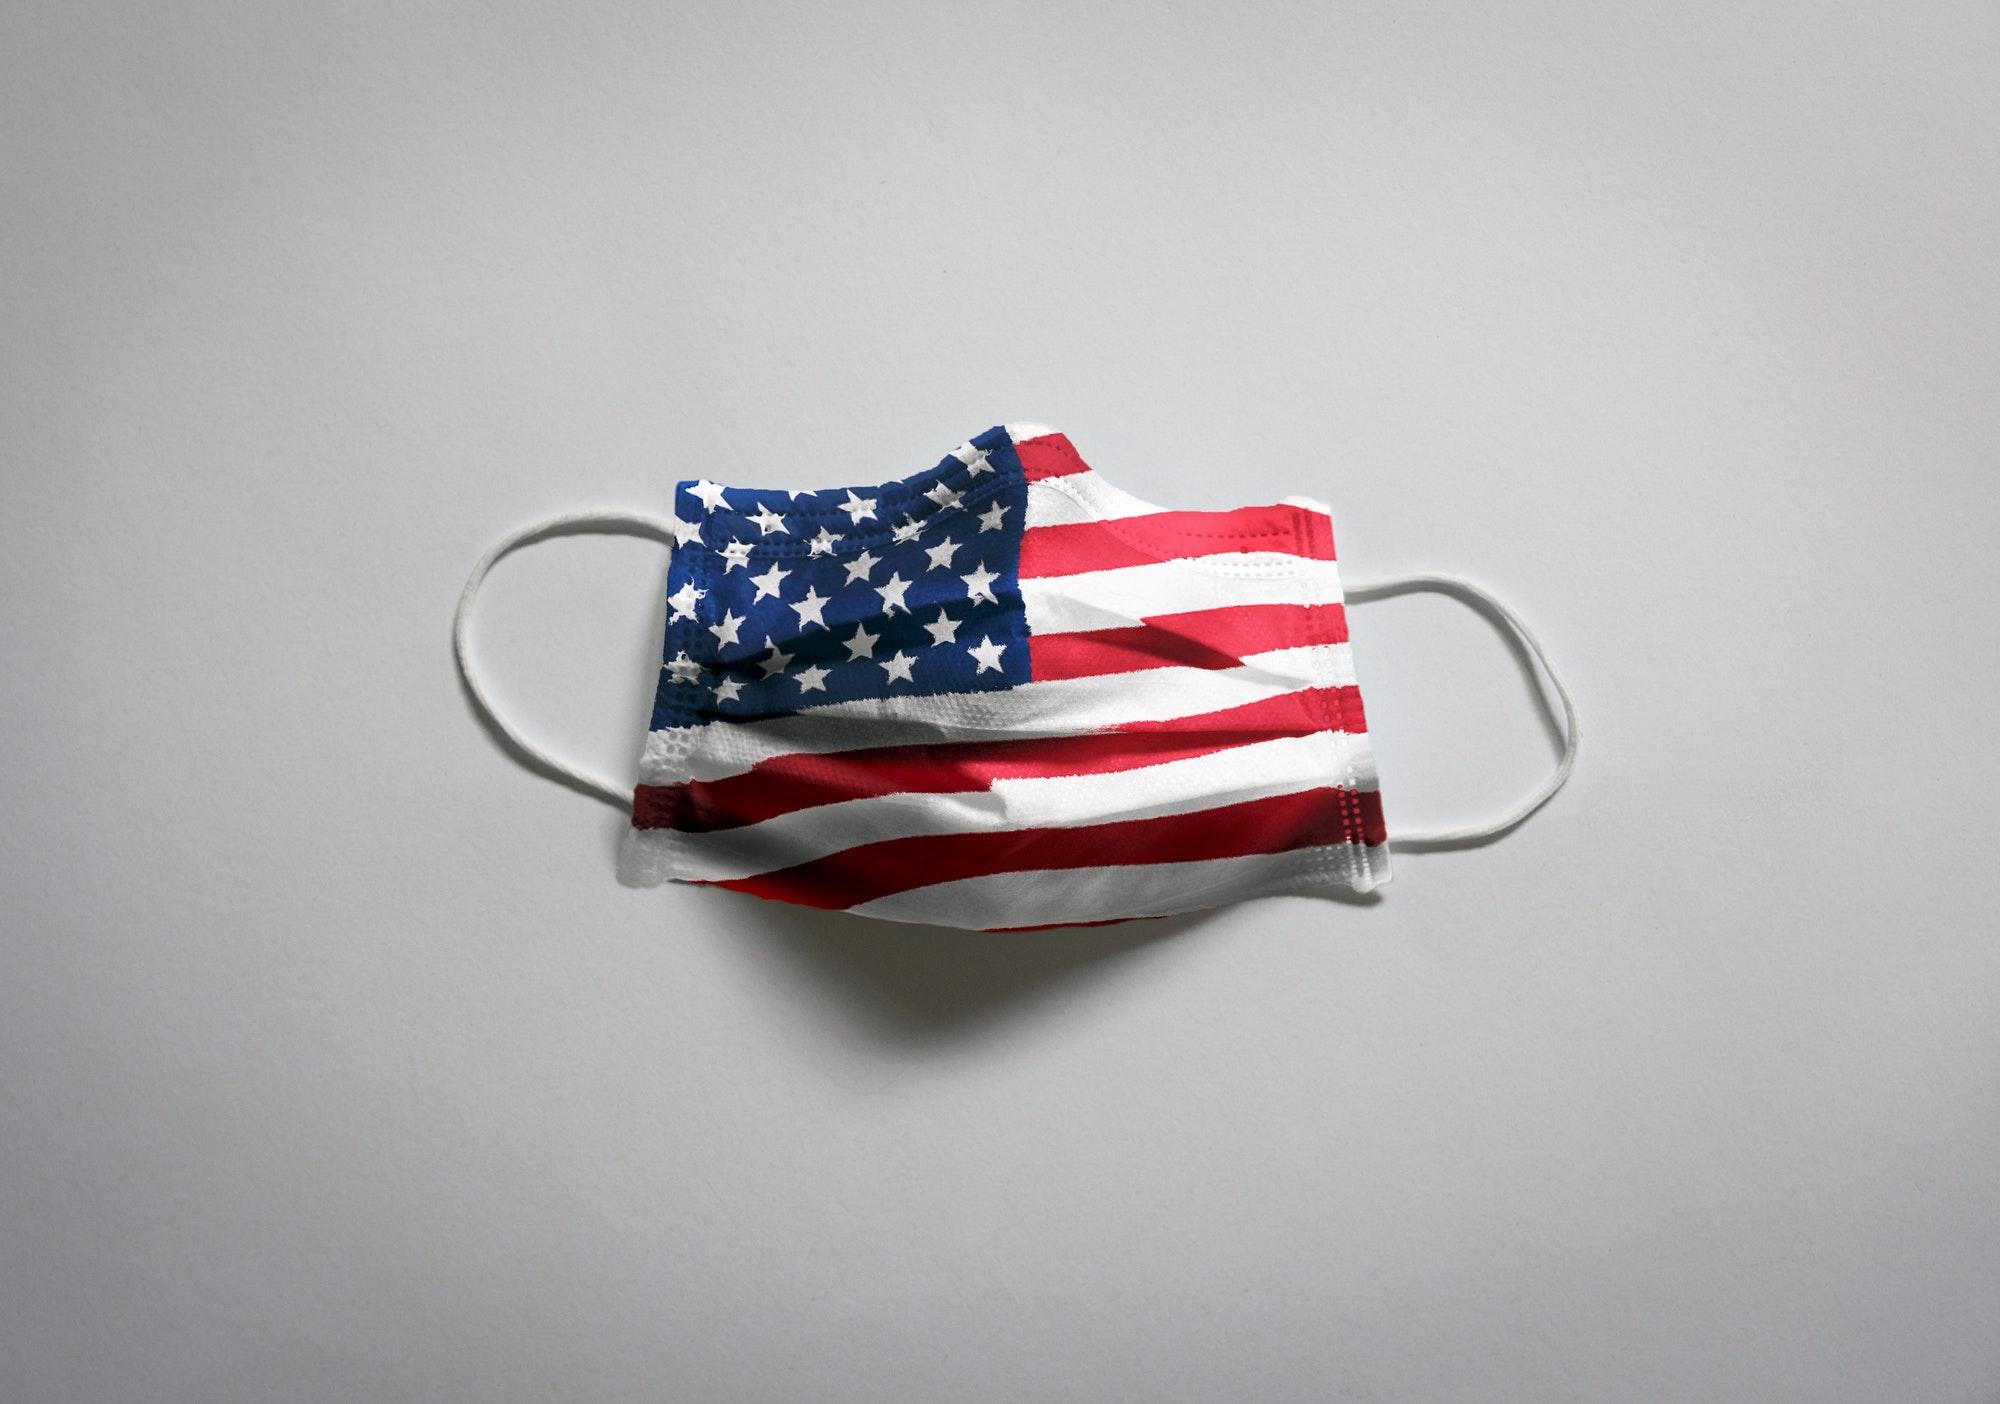 Face mask, covid, american flag, stars and stripes on mask, corona, coronavirus.